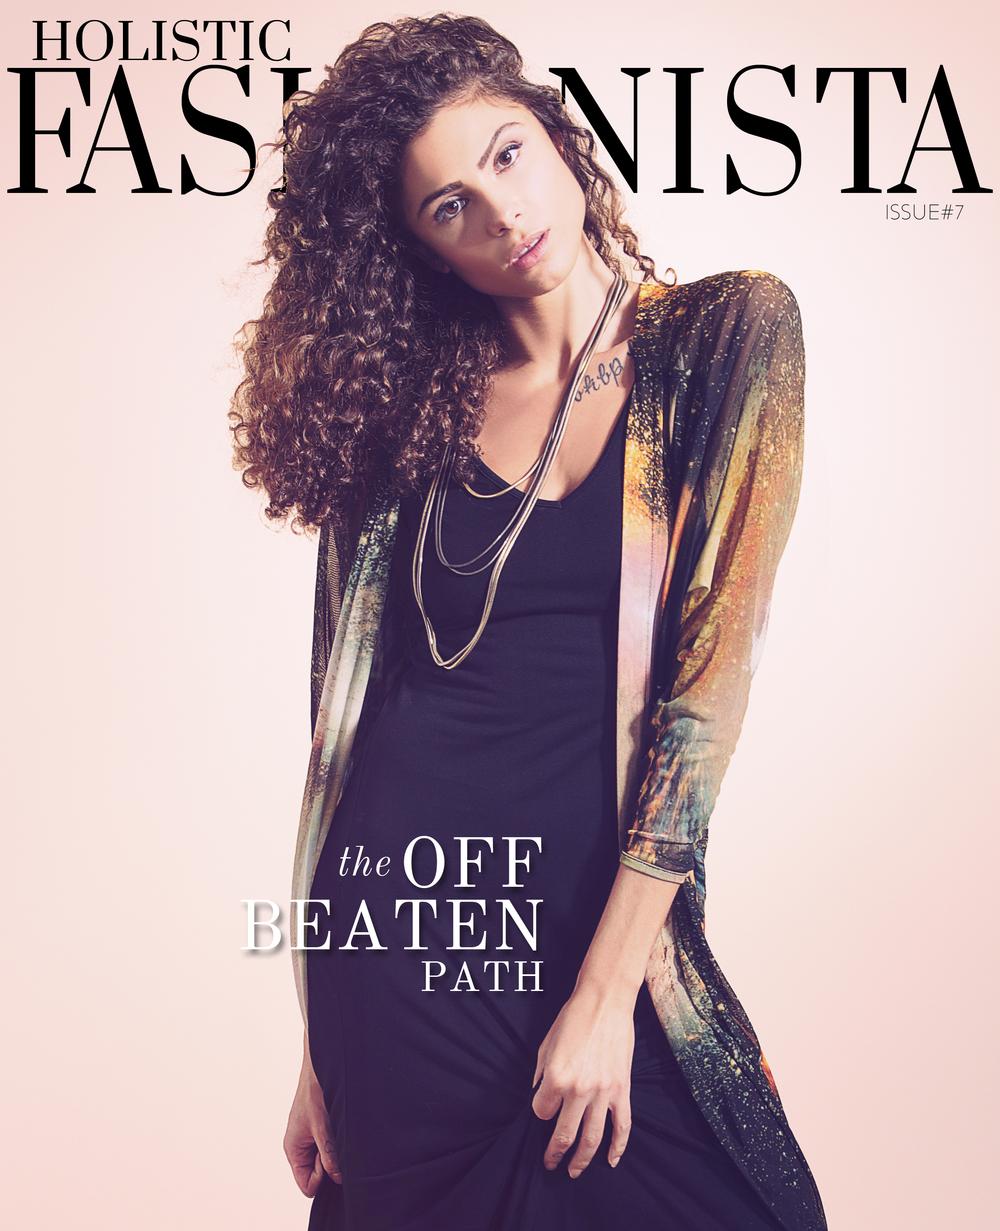 Holistic Fashionista Magazine Issue #8